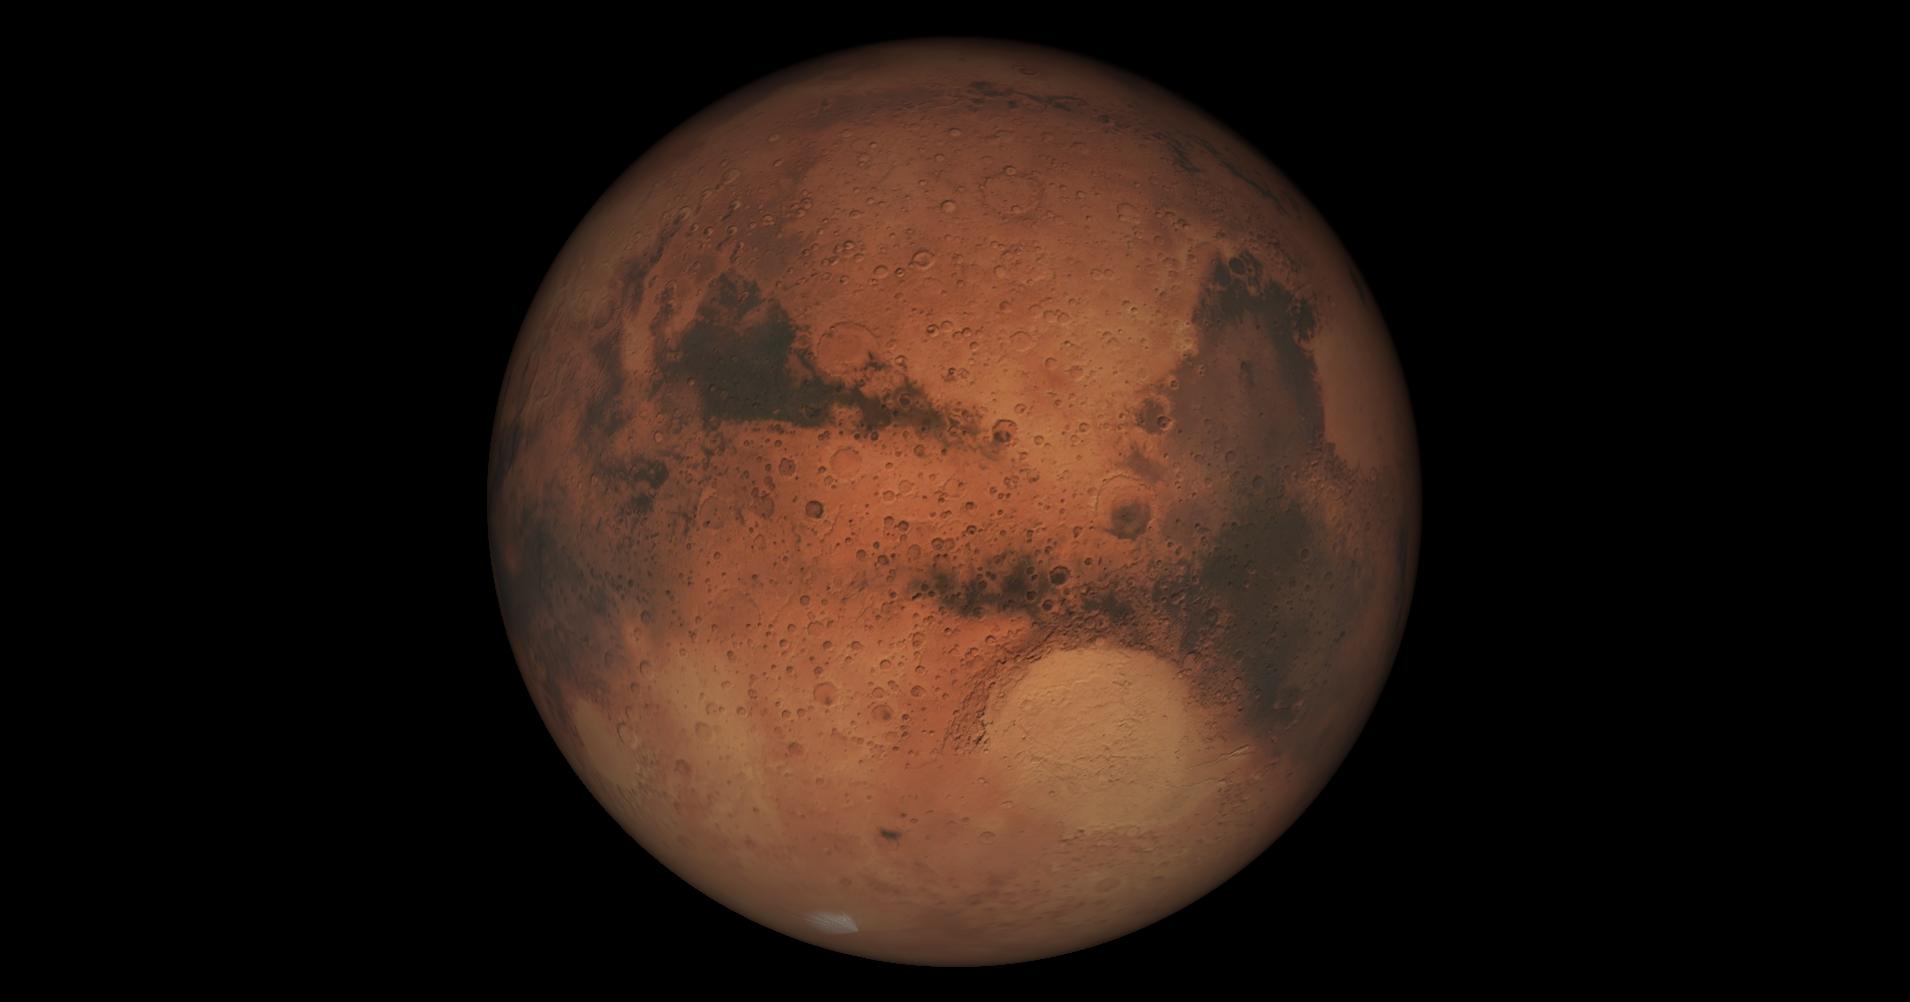 Mars_2003_234600.png.3c6b401dad26047c5930647779aa5993.png